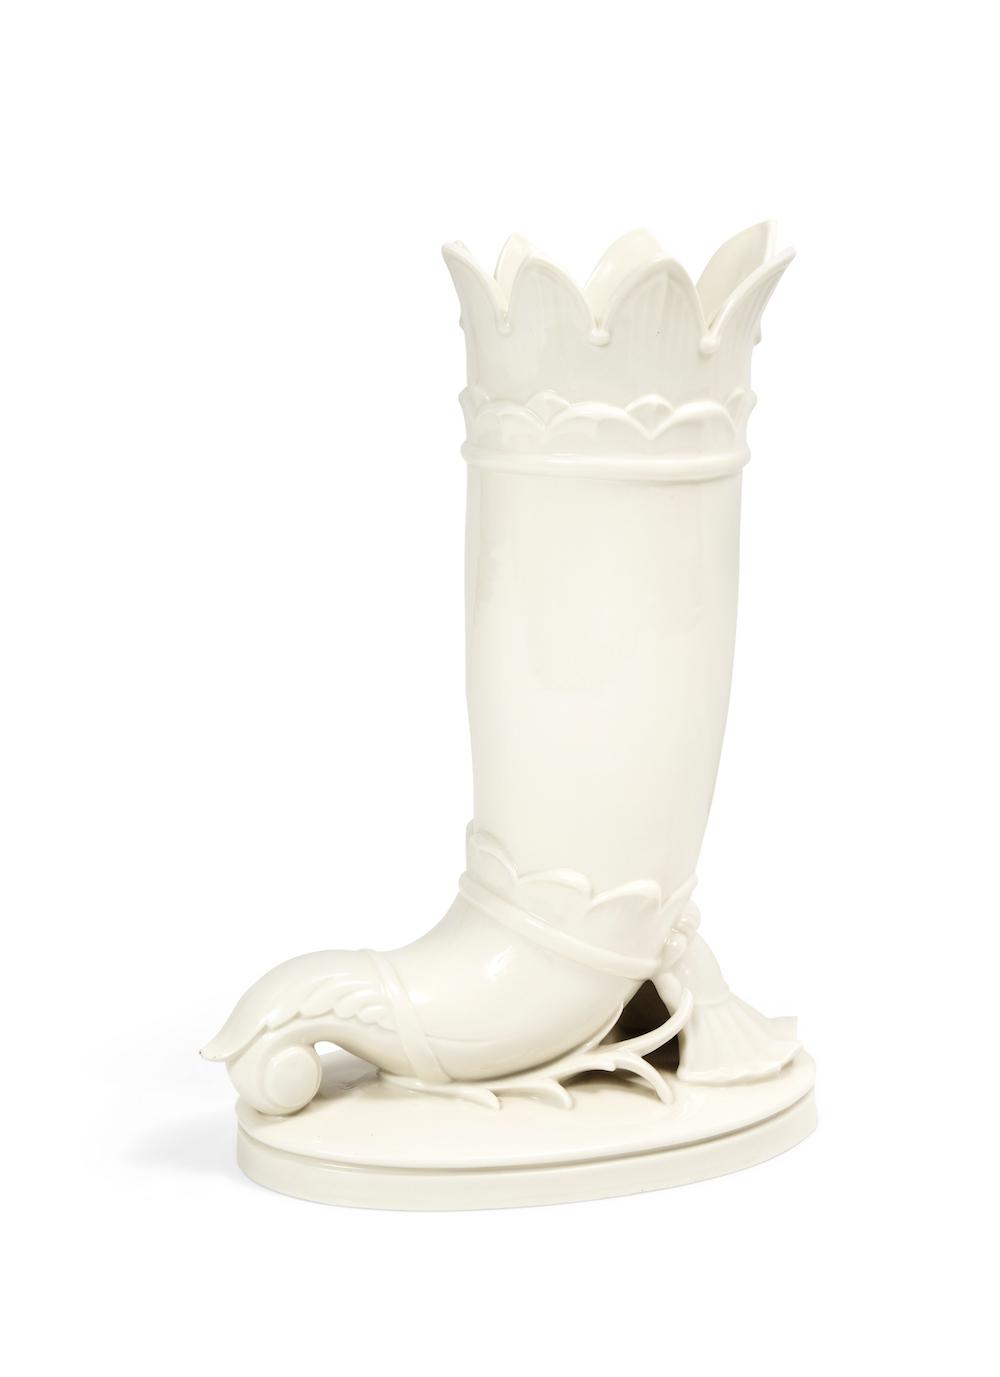 German Porcelain Horn 6R1A8598.jpg